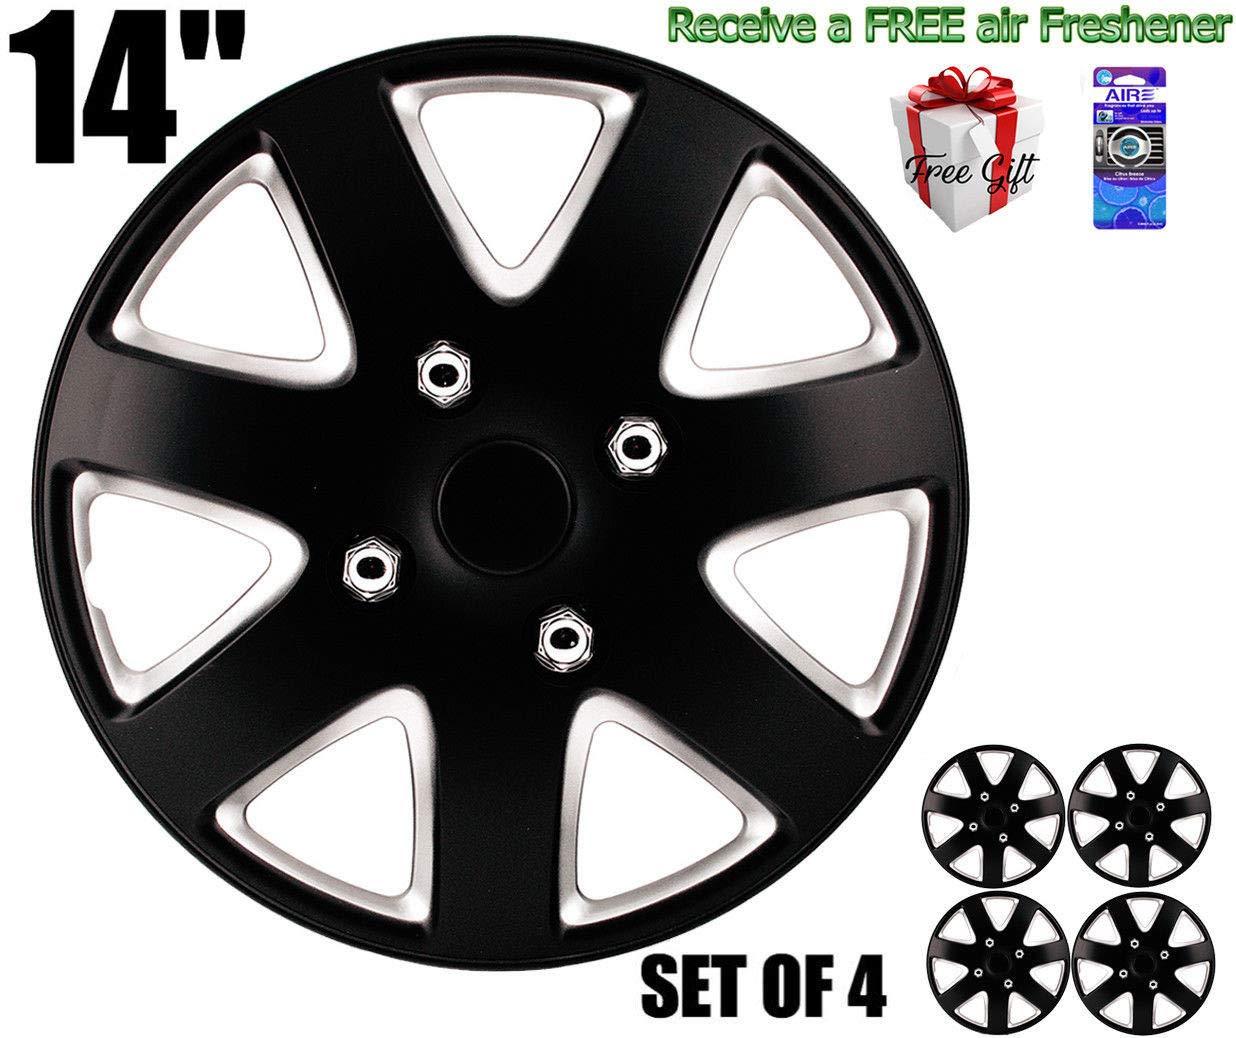 Amazon.com: SUMEX 50689BS Universal Fit Silverstone Wheel Trims 14-inch - Black Set of 4: Automotive